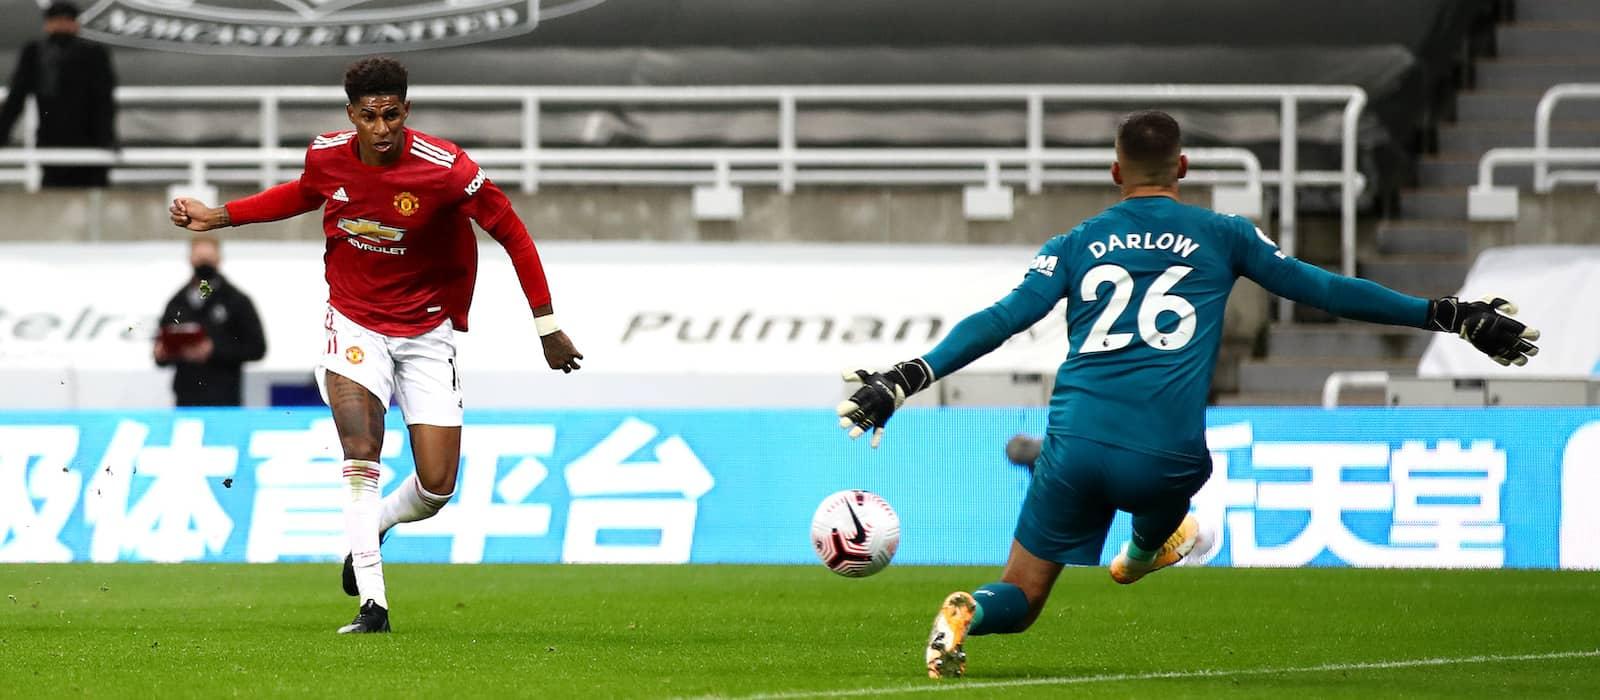 Marcus Rashford puts in tremendous performance vs. Newcastle